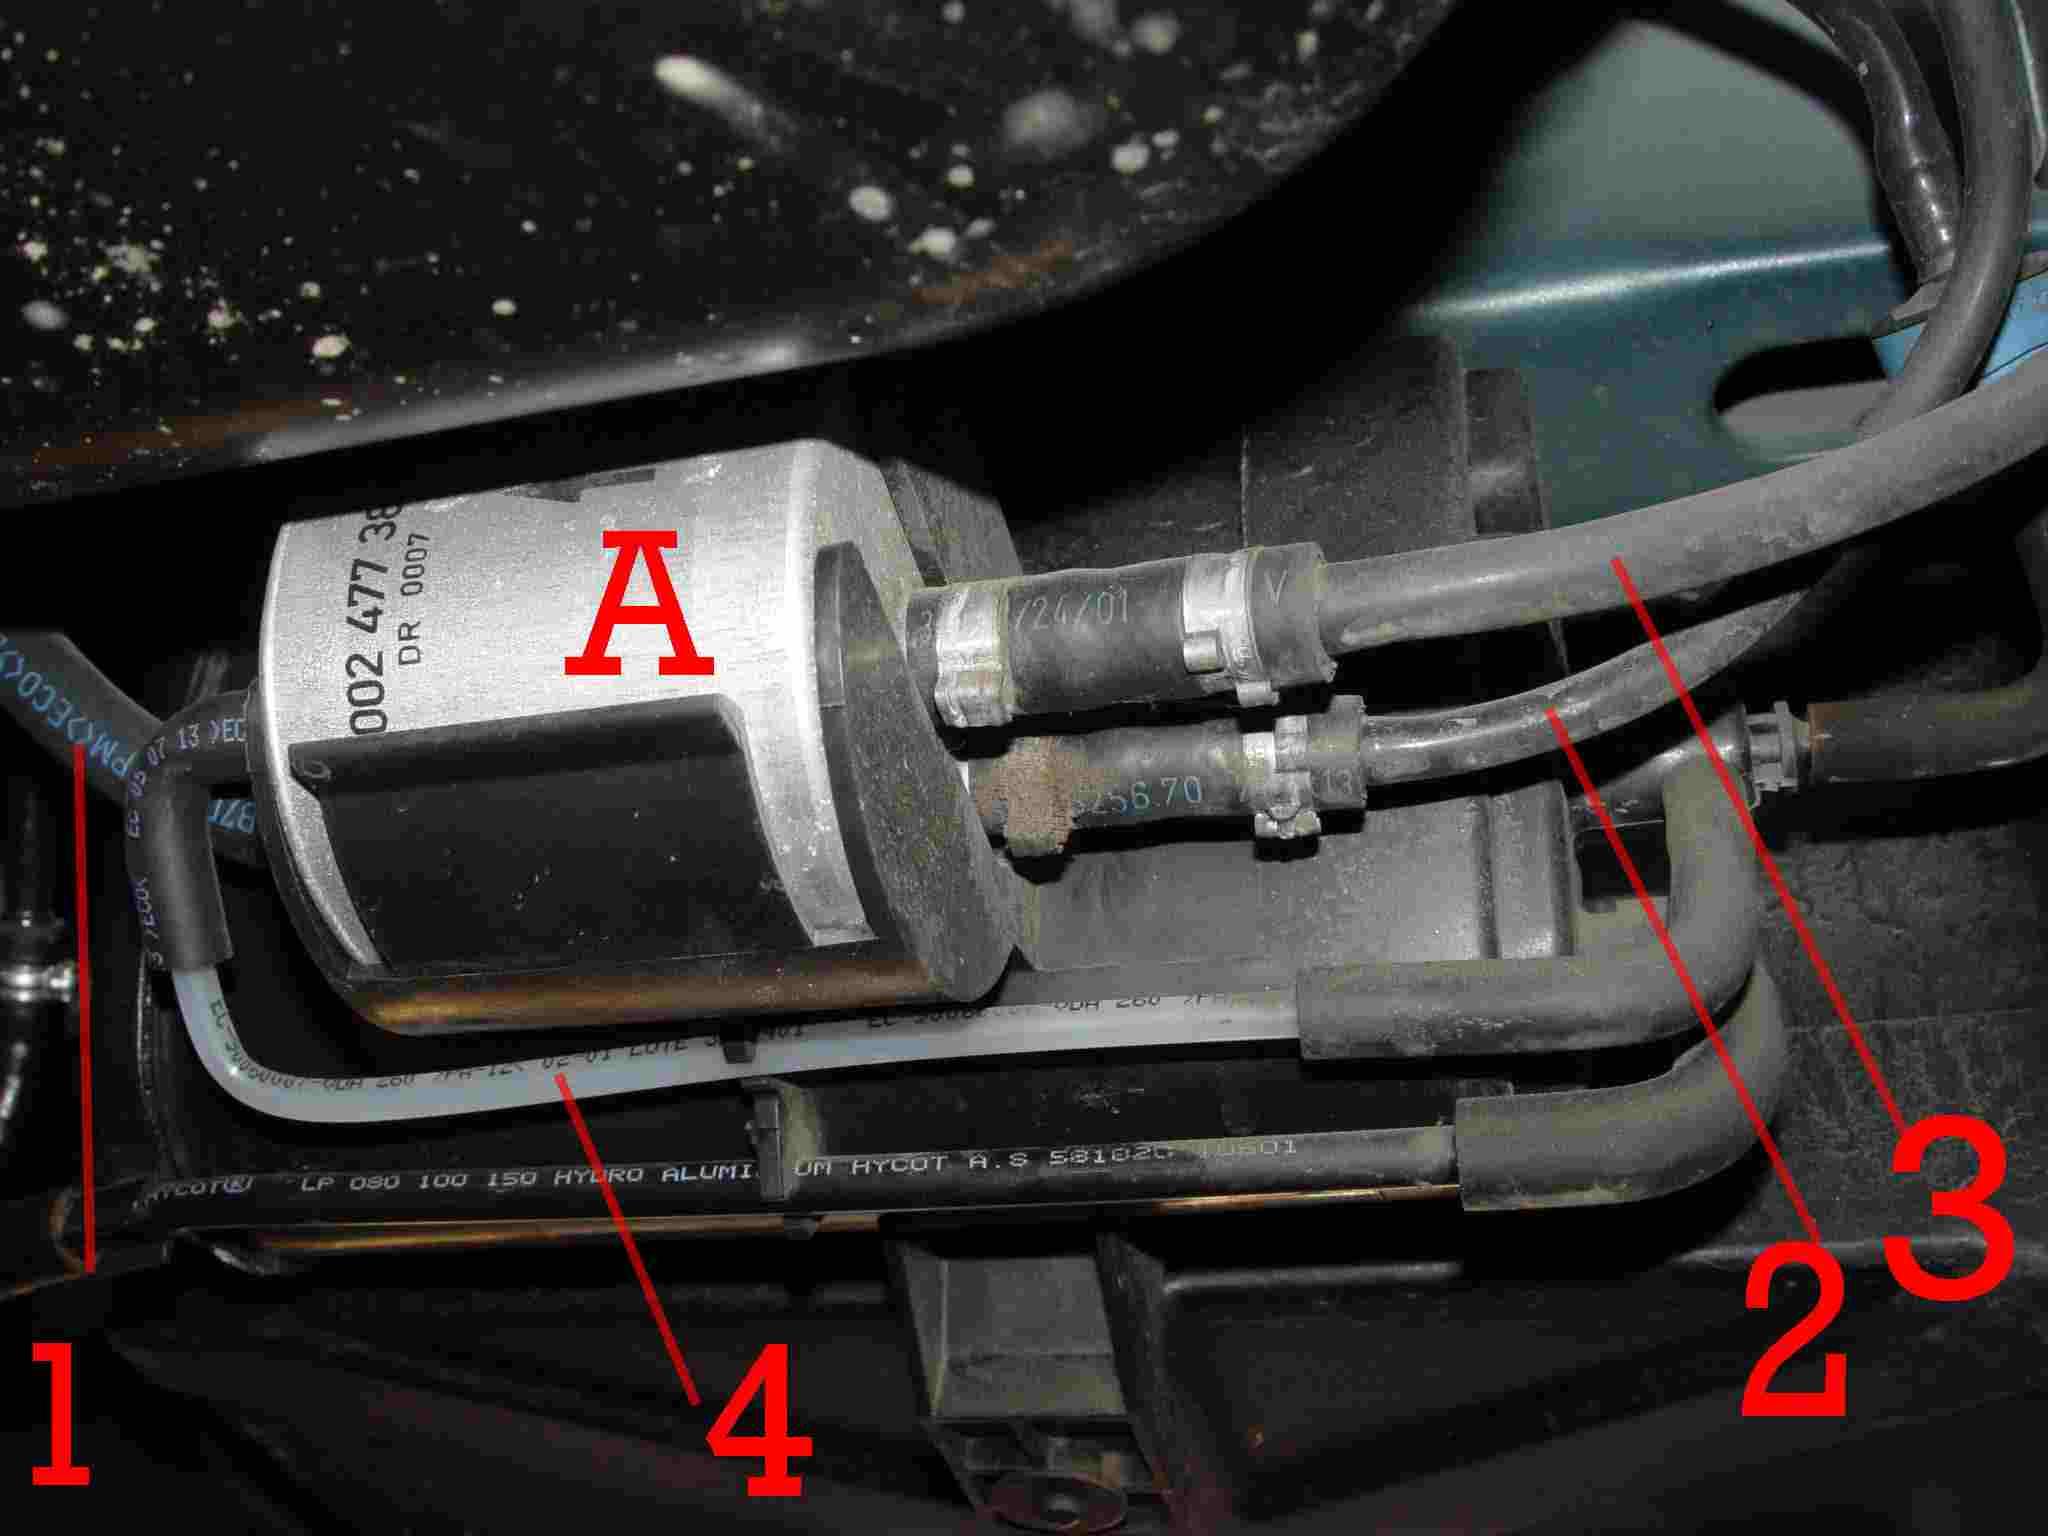 Chrysler 300 Fuel Filter Location 2007 Chysler Pt Cruiser 3